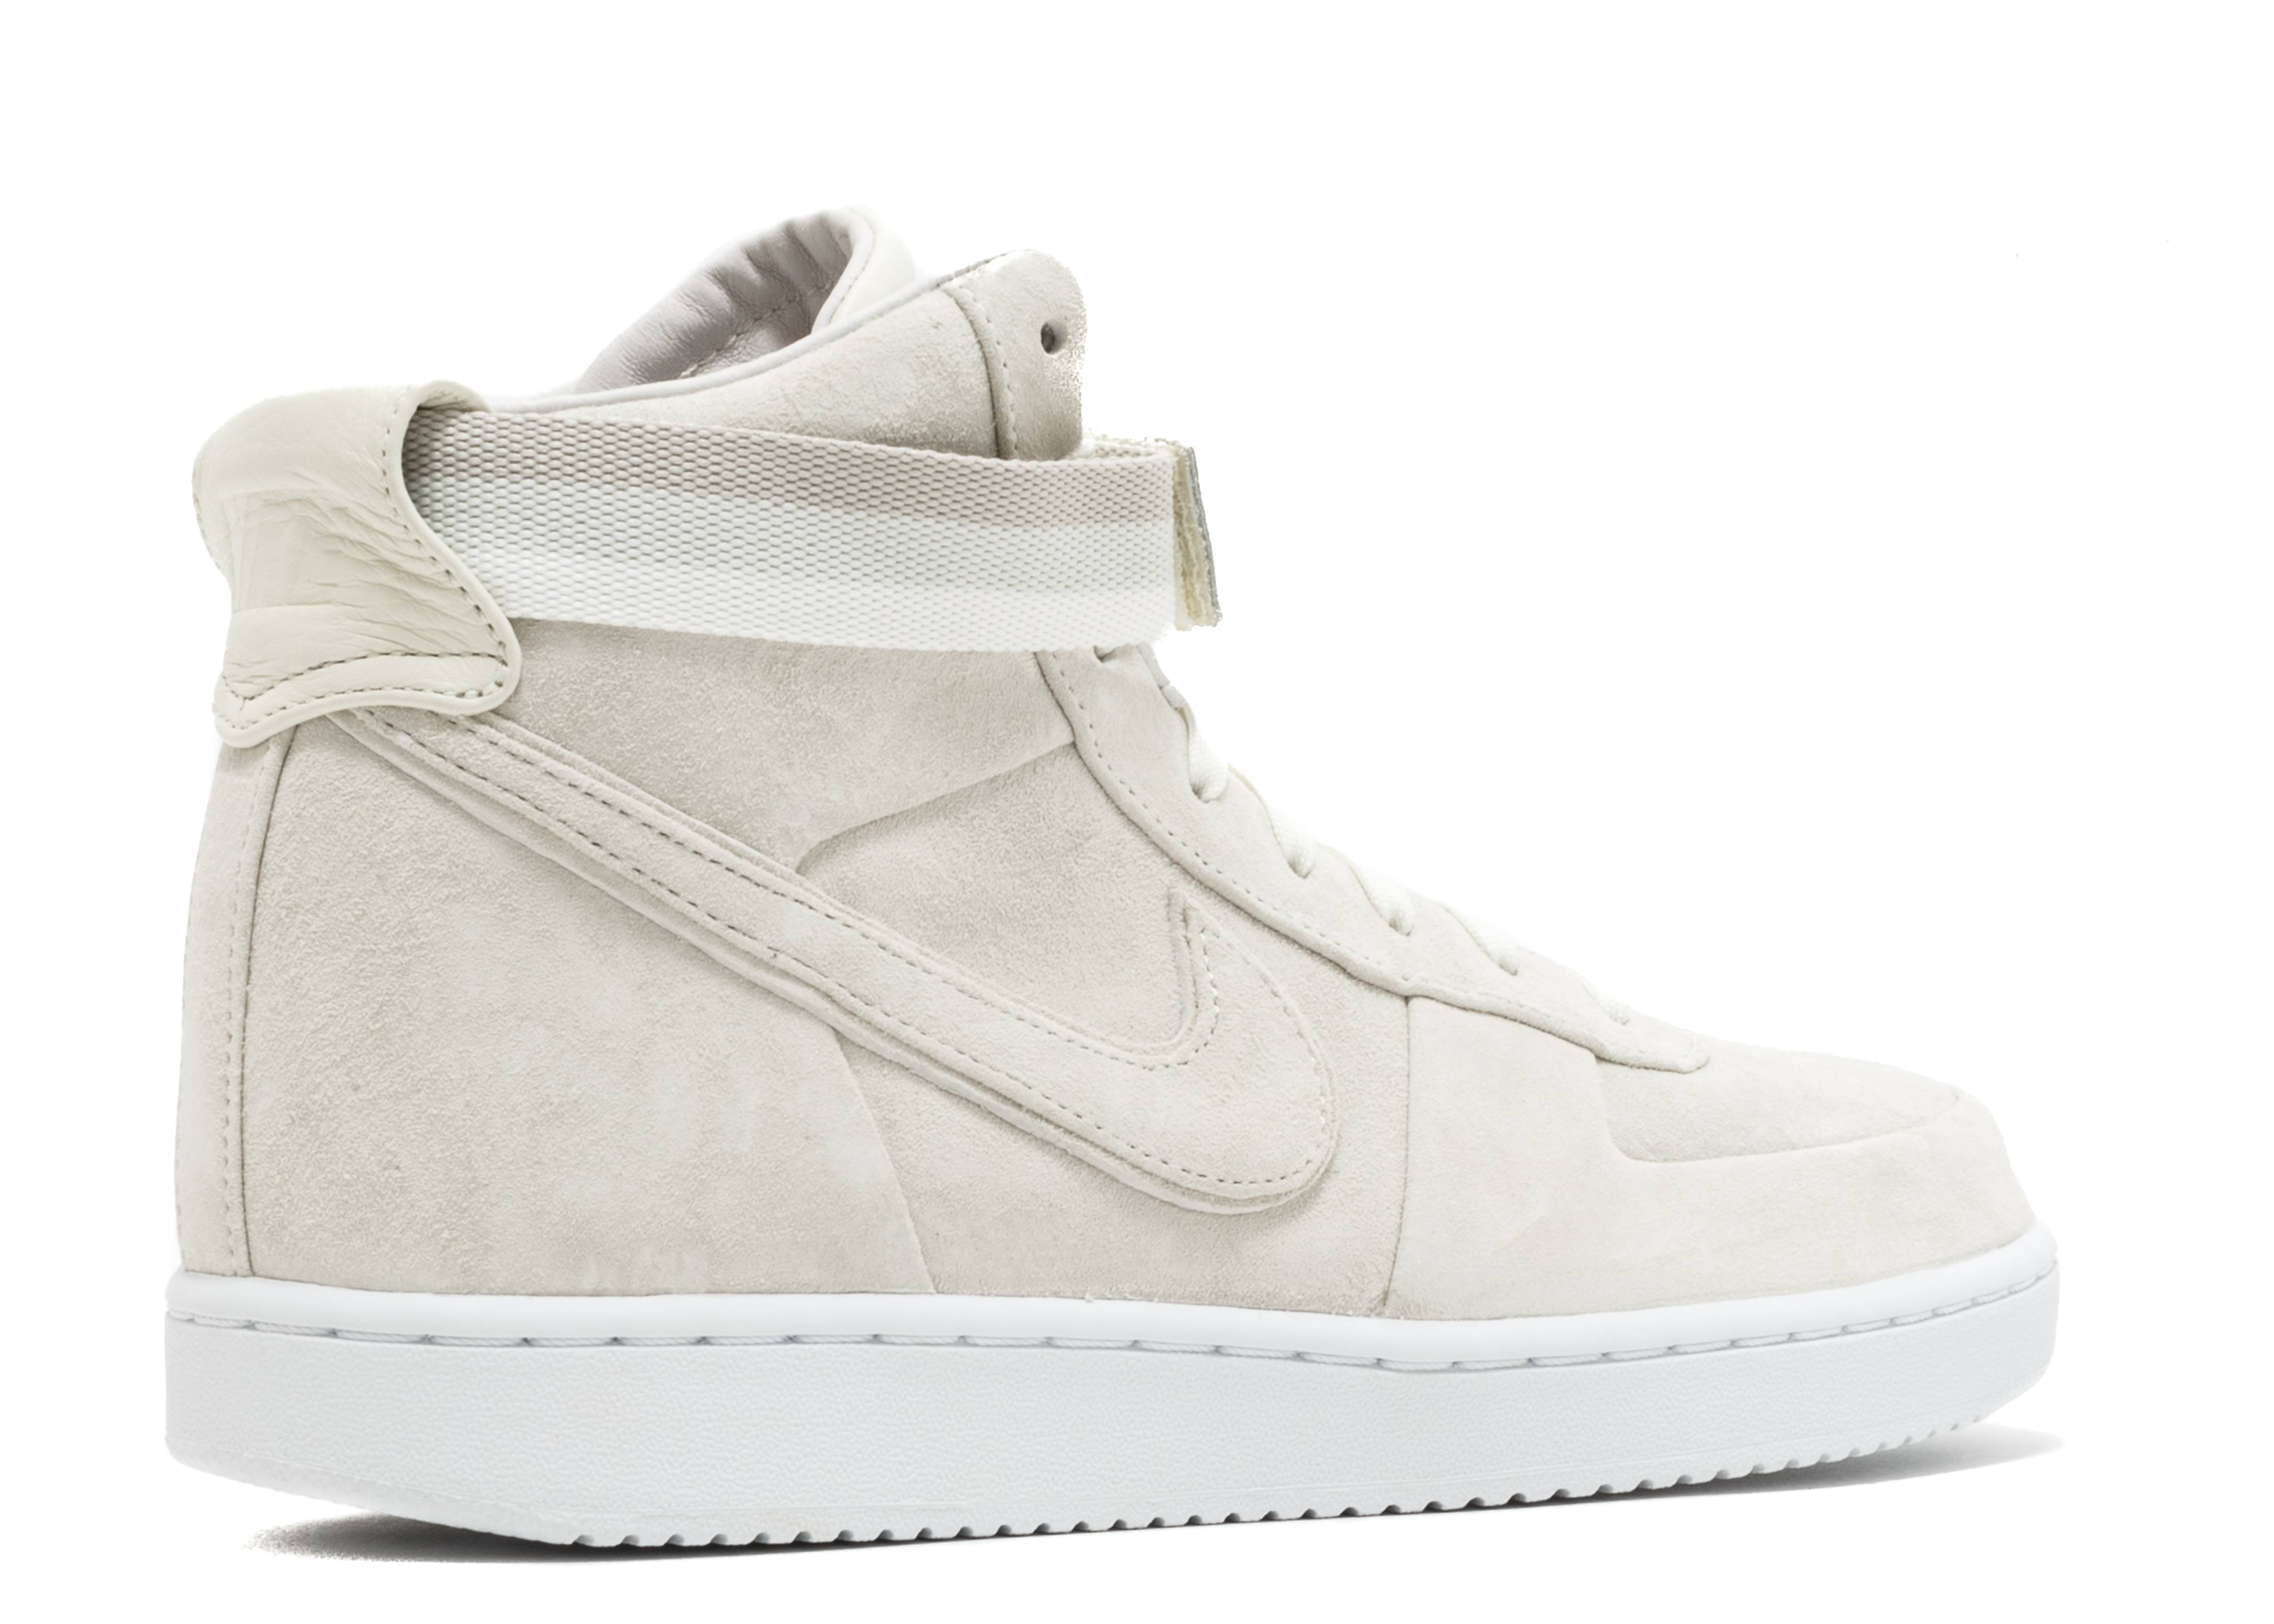 sports shoes 401bf 03755 Vandal High Prm